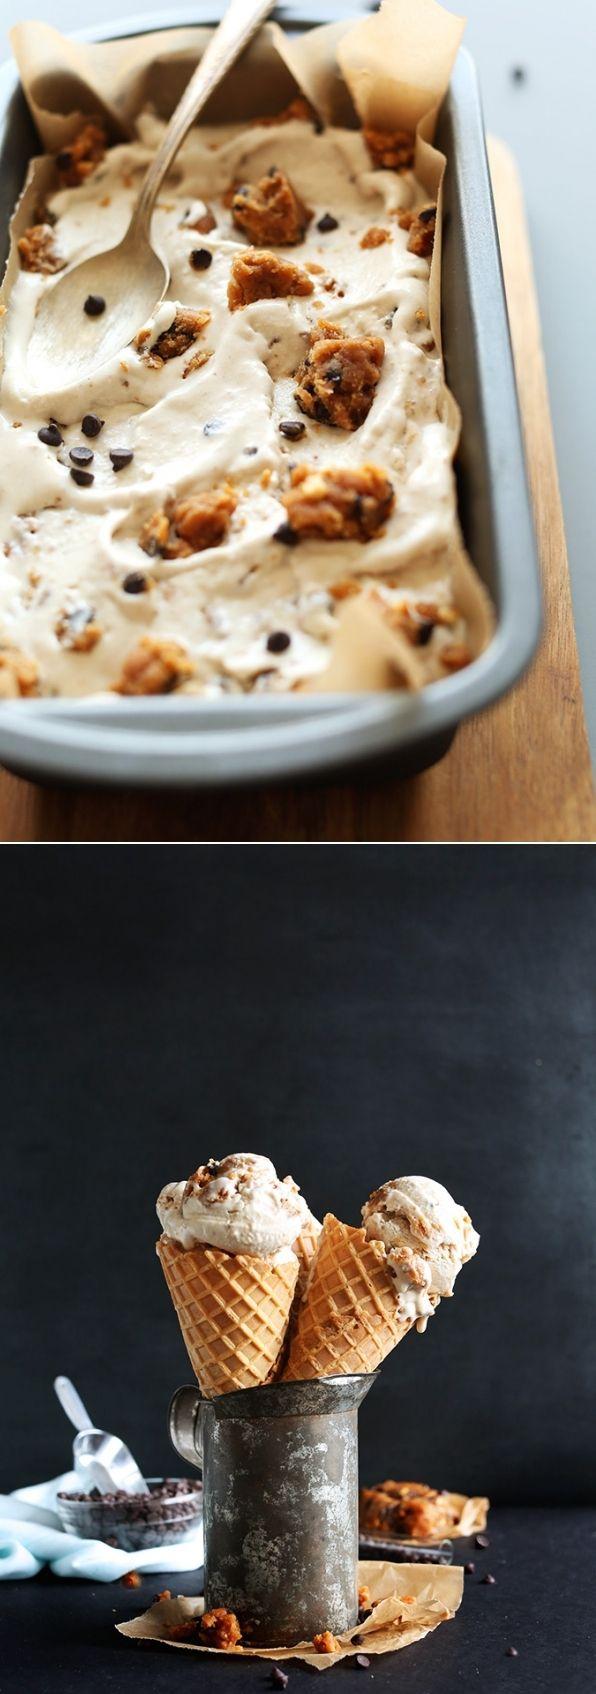 Amazing Vegan Chocolate Chip Peanut Butter Cookie Dough Ice Cream! A MEGA creamy  ice cream loaded with peanut butter chocolate chip cookie dough! So creamy, decadent  and so easy to make!